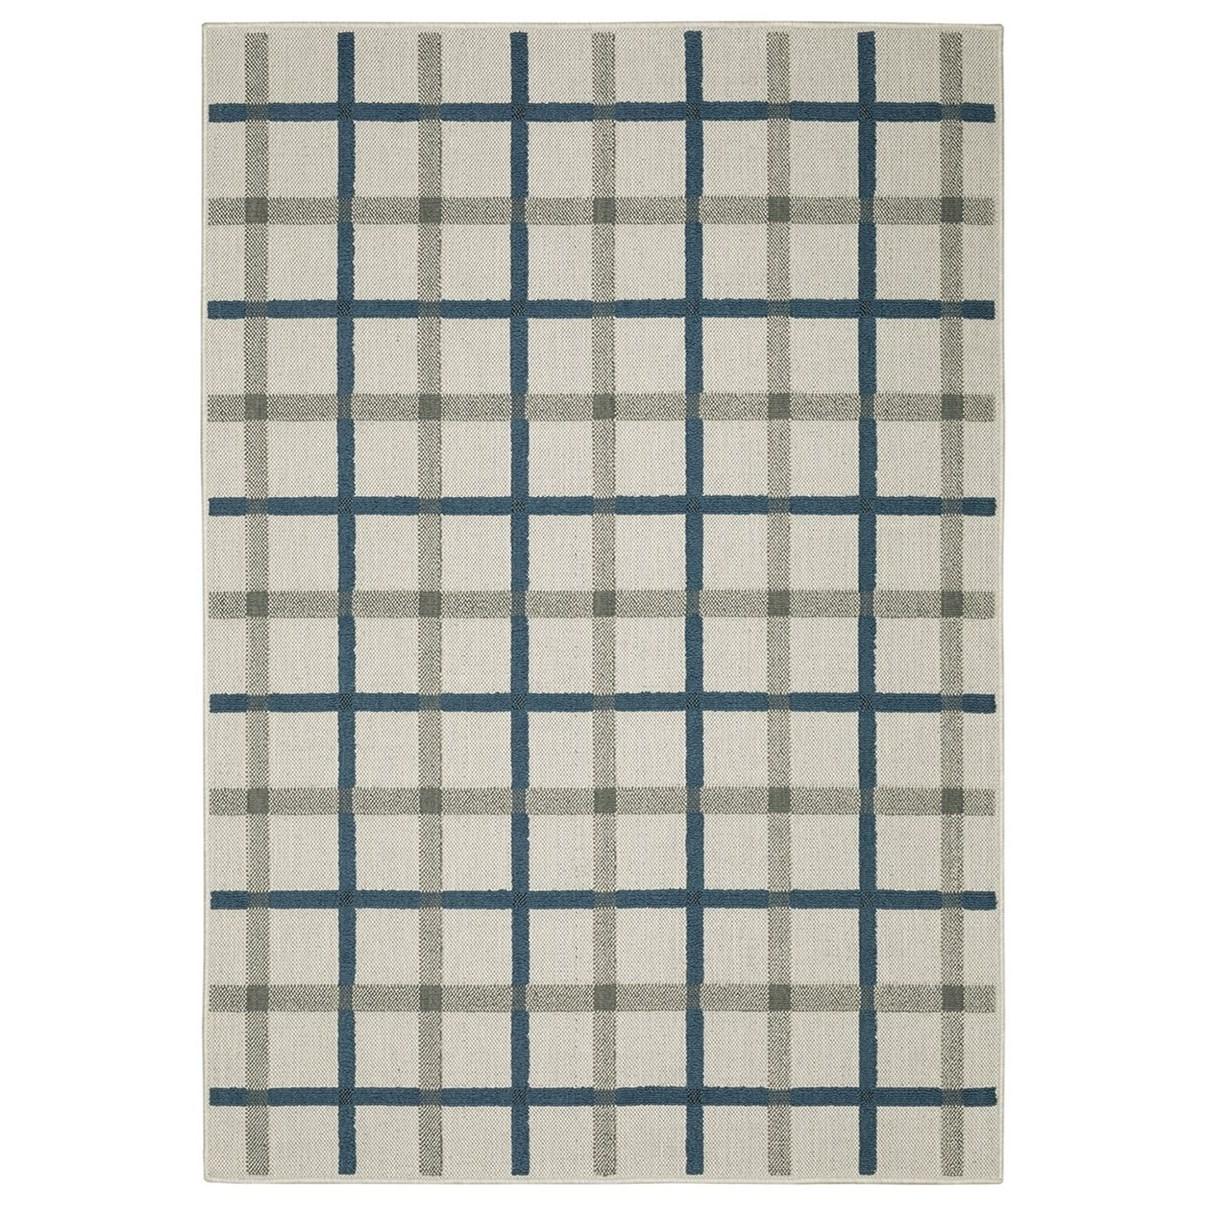 "Torrey 7' 10"" x 10' Rug by Oriental Weavers at Novello Home Furnishings"